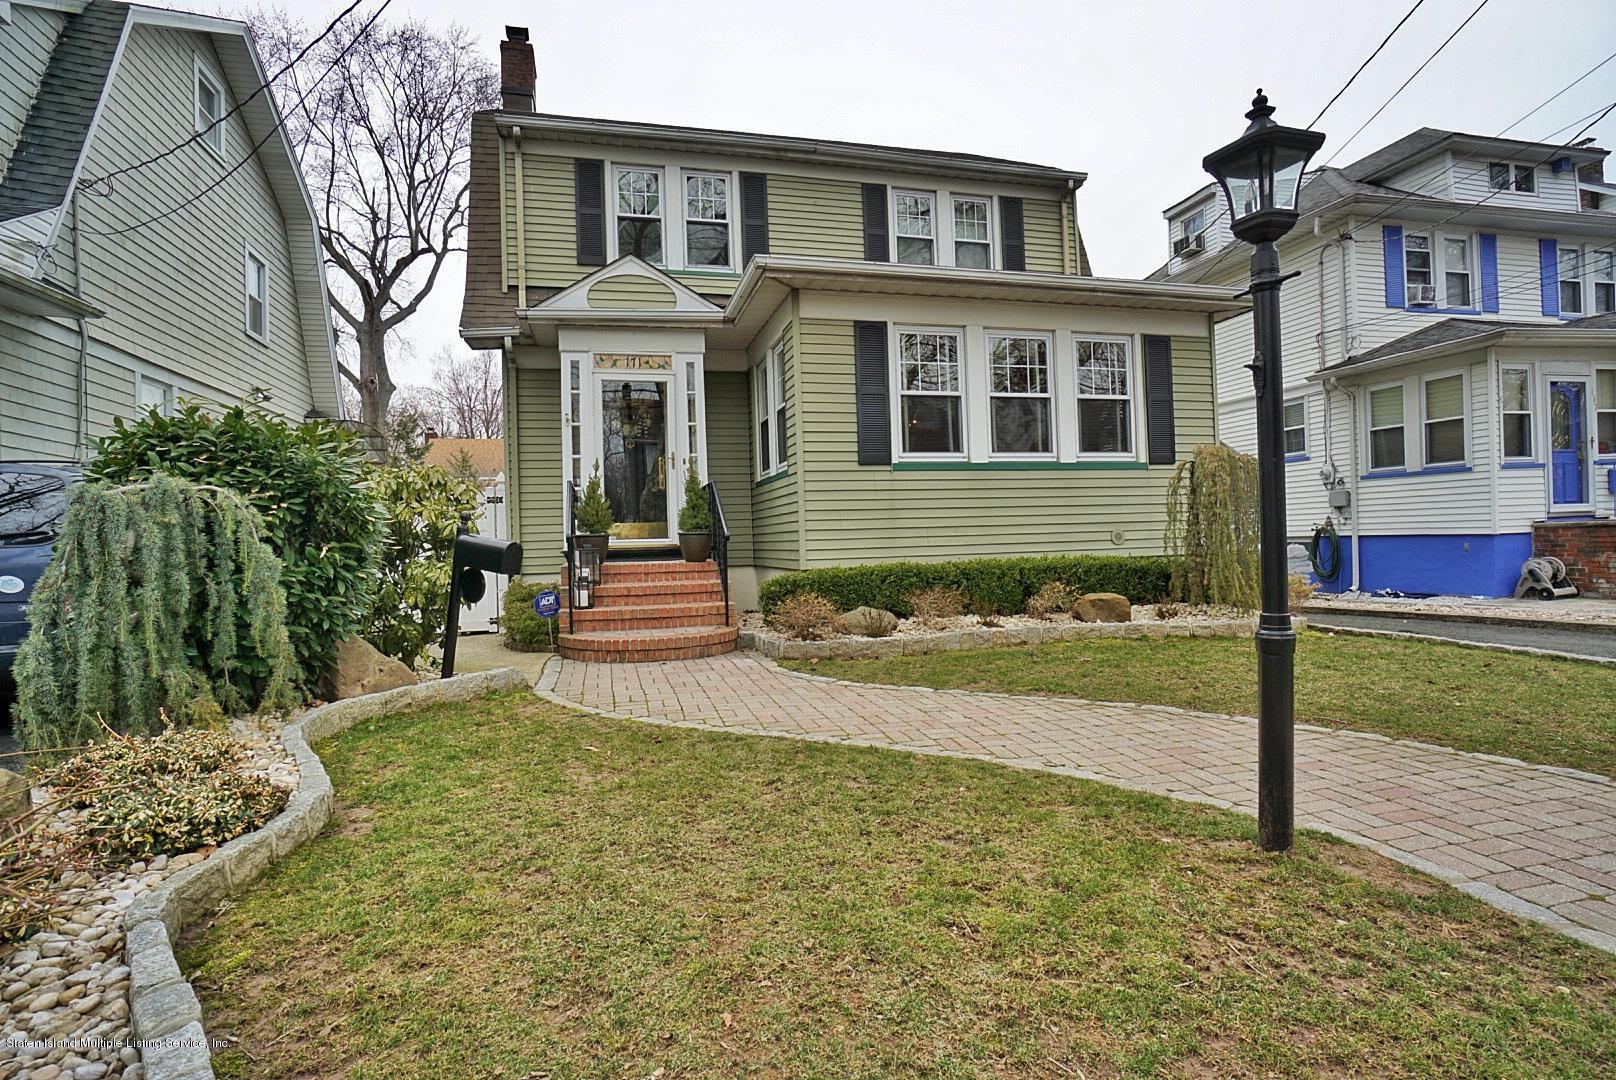 Single Family - Detached 171 Keiber Court  Staten Island, NY 10314, MLS-1127425-4